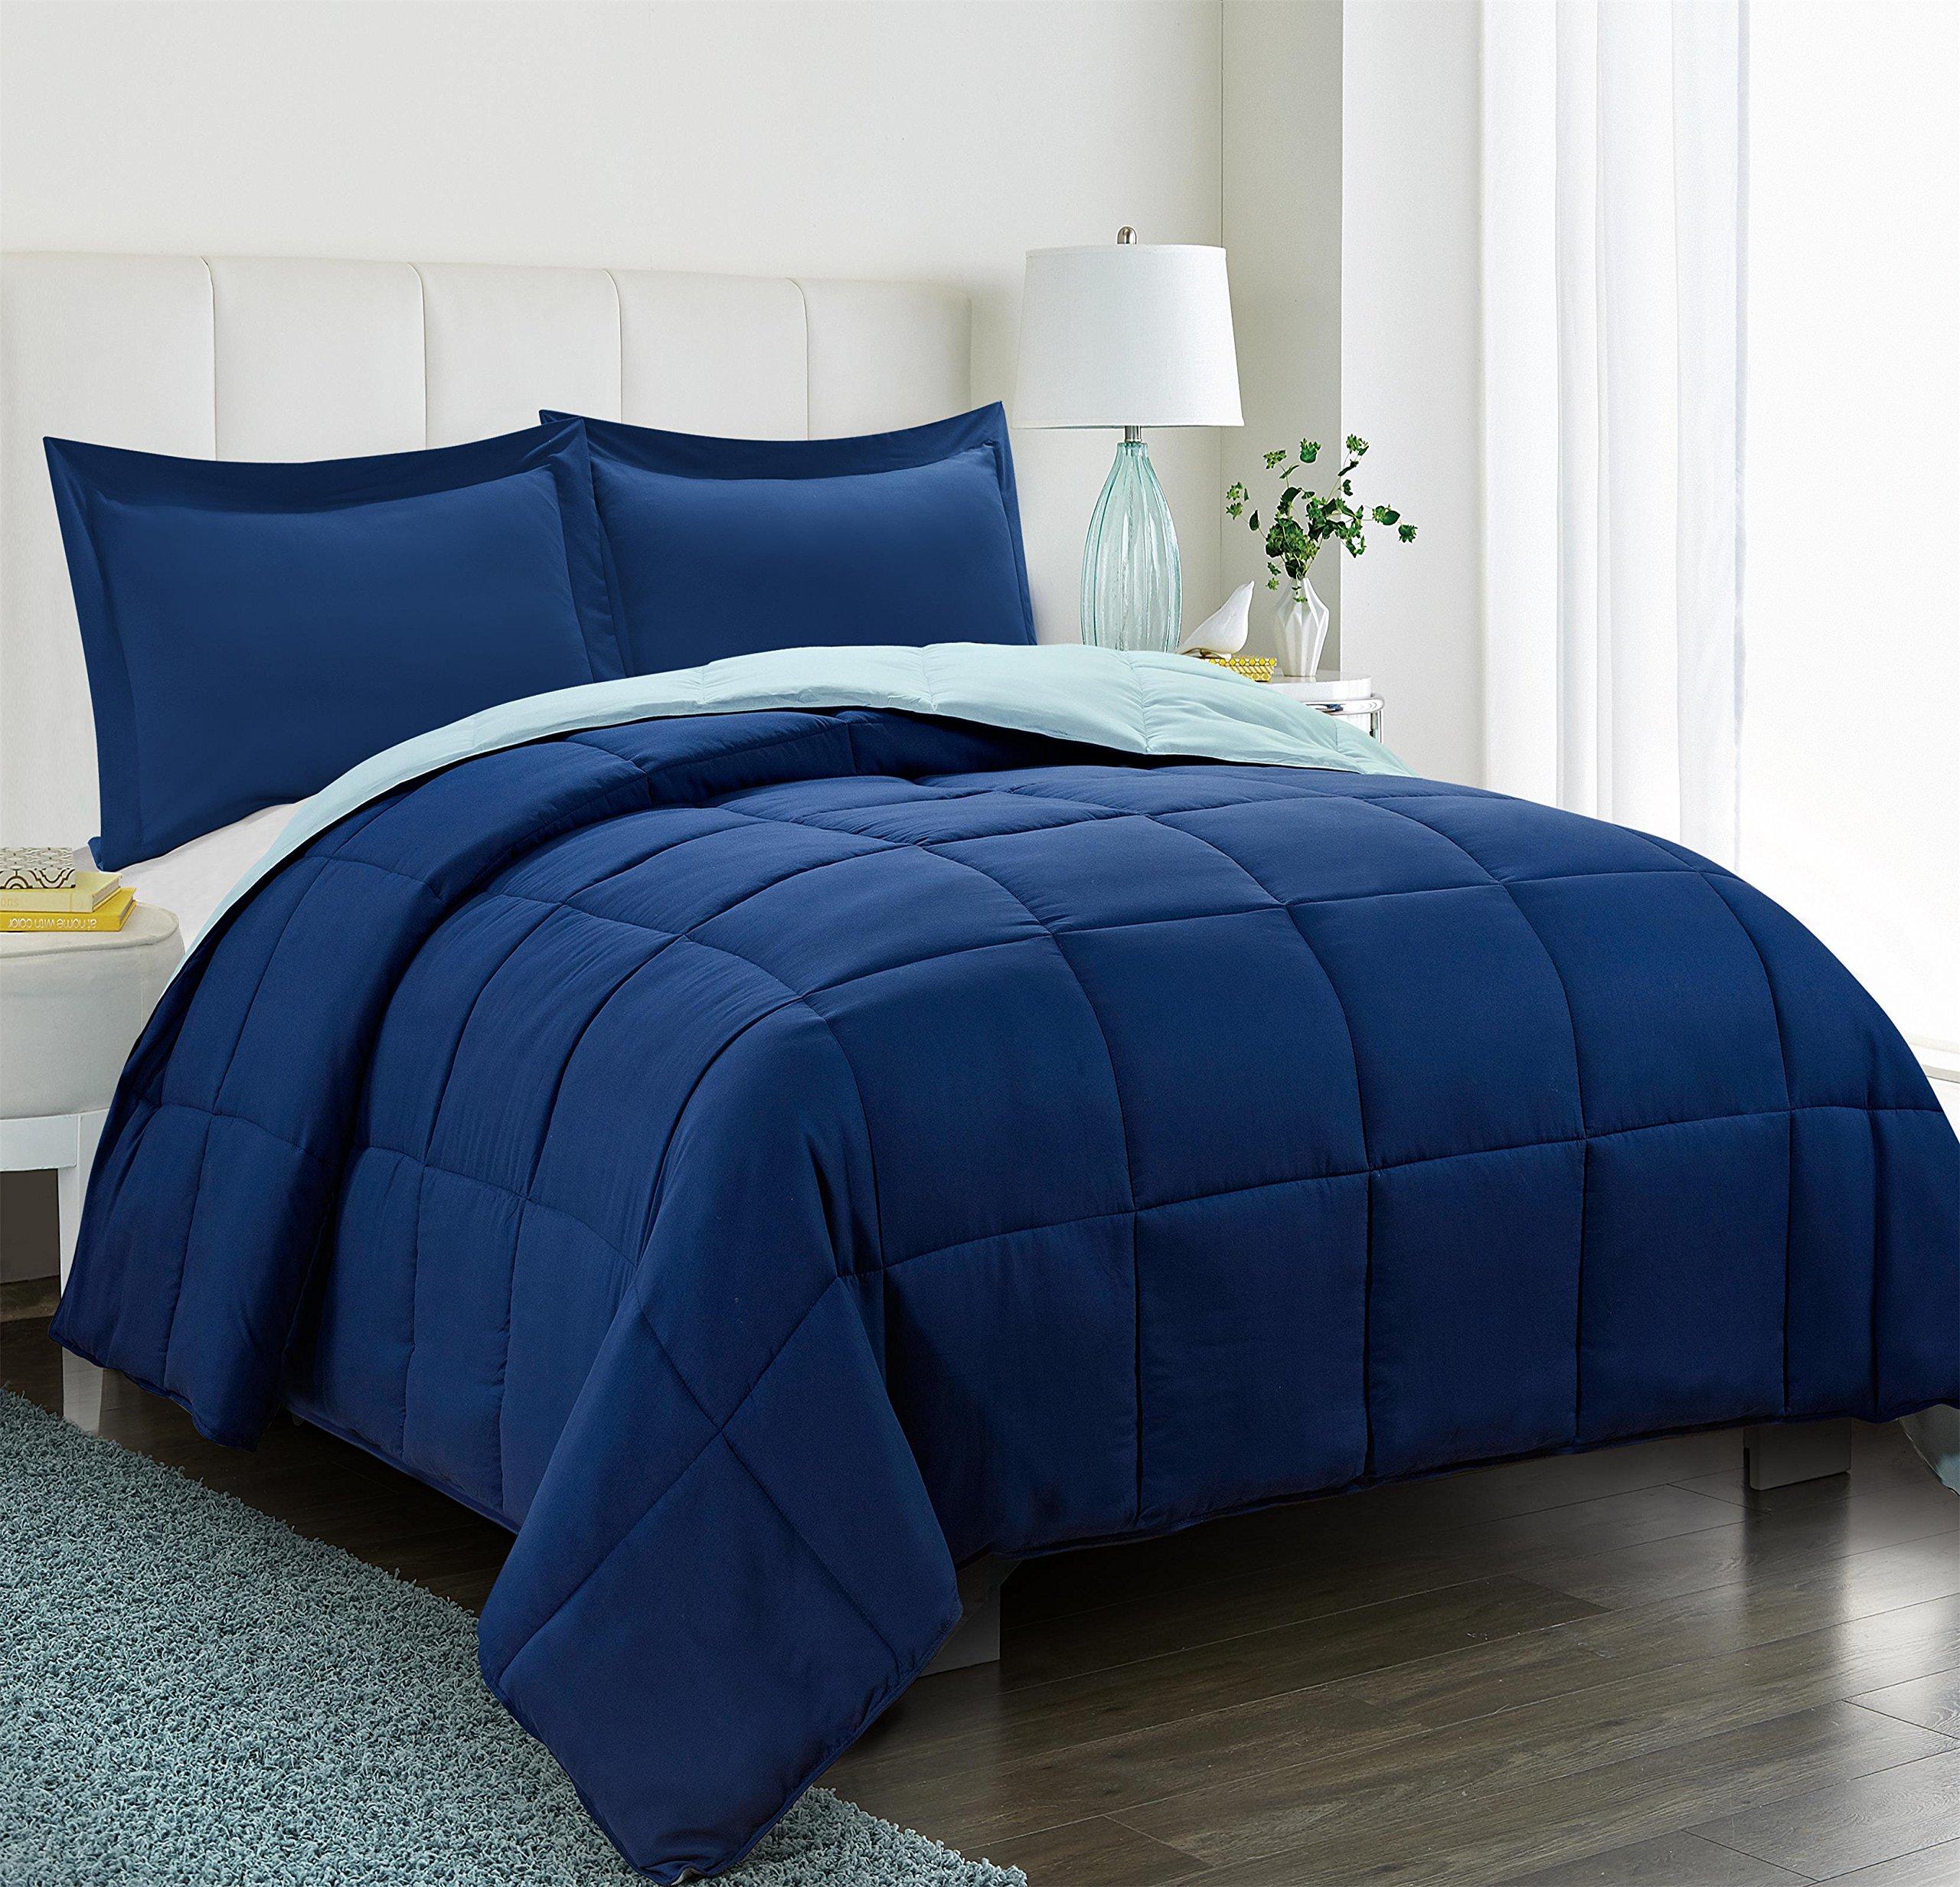 HIG 2pc Down Alternative Comforter Set -All Season Reversible Comforter Sham - Quilted Duvet Insert Corner Tabs -Box Stitched –Hypoallergenic, Soft, Fluffy (Twin/Twin XL, Navy/Light Blue)